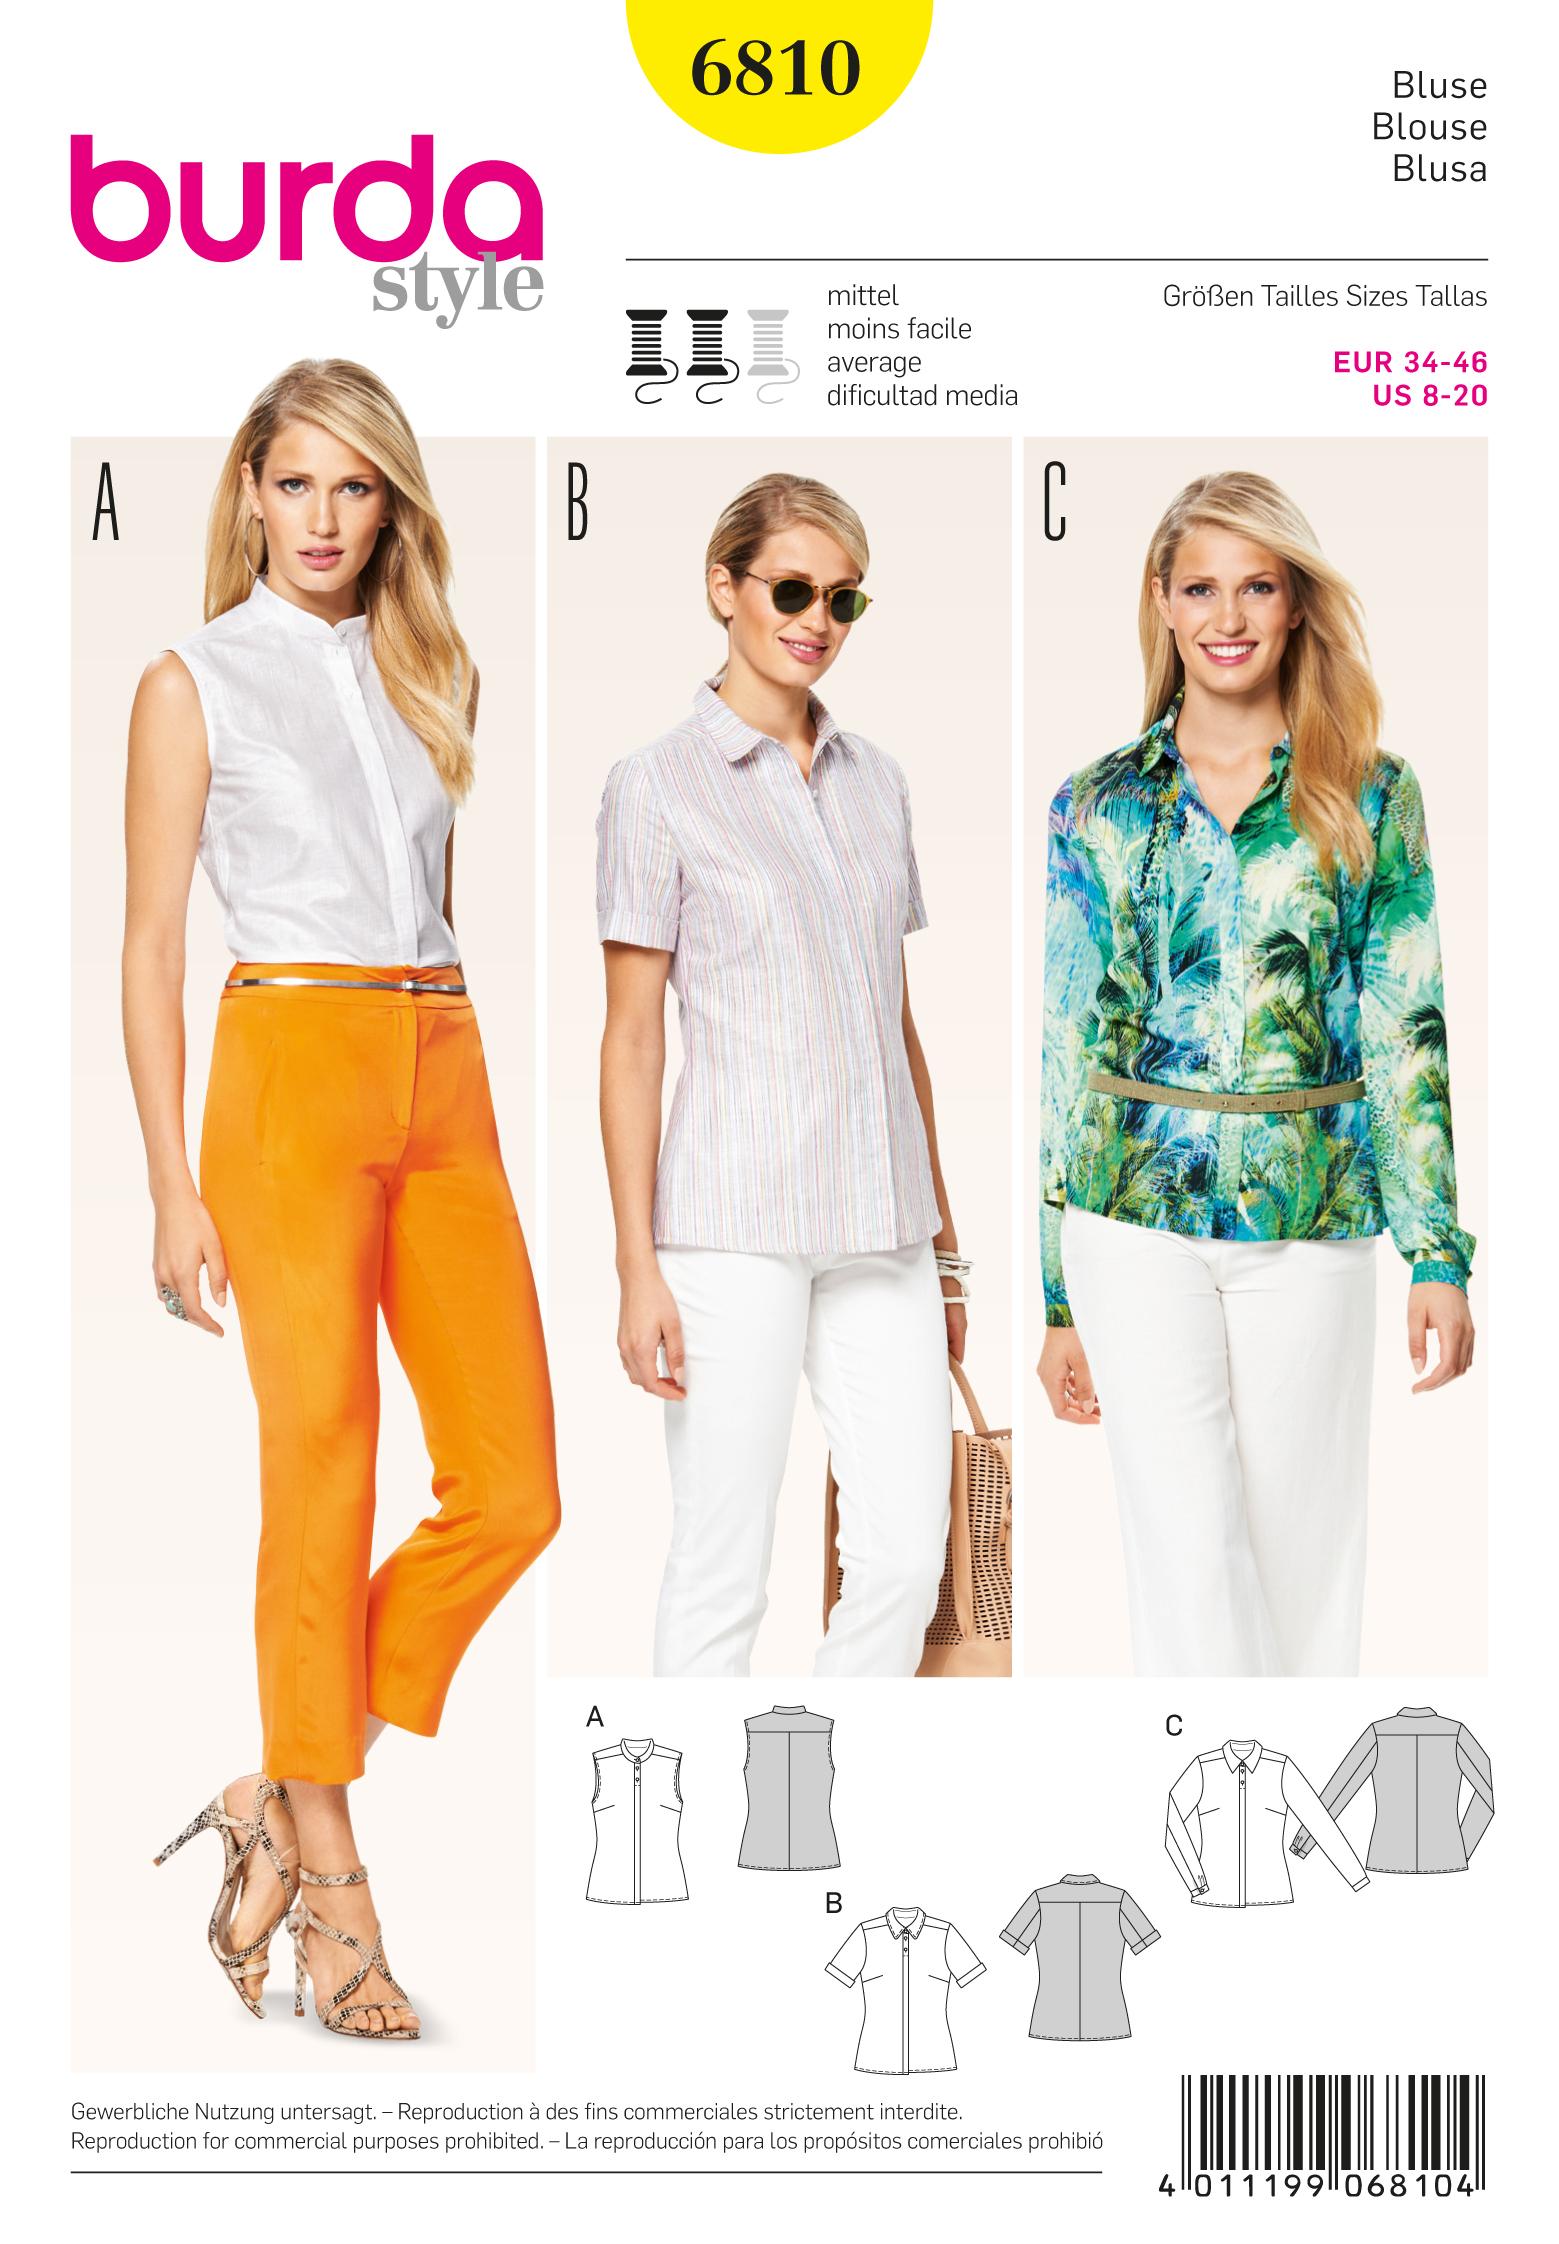 Burda 6810 Burda Style Tops Shirts Blouses